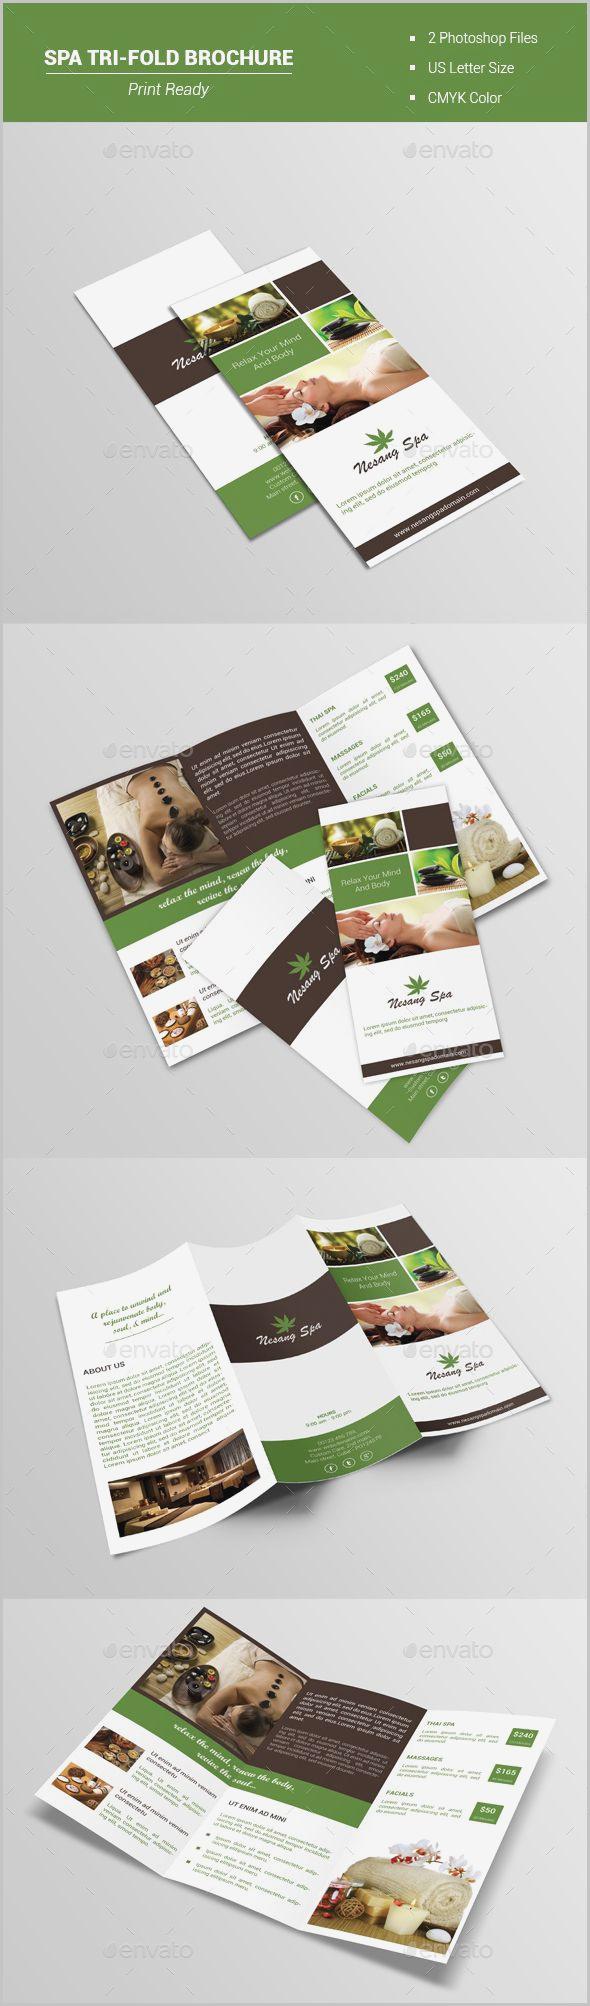 Free Printable Spa Brochure Templates